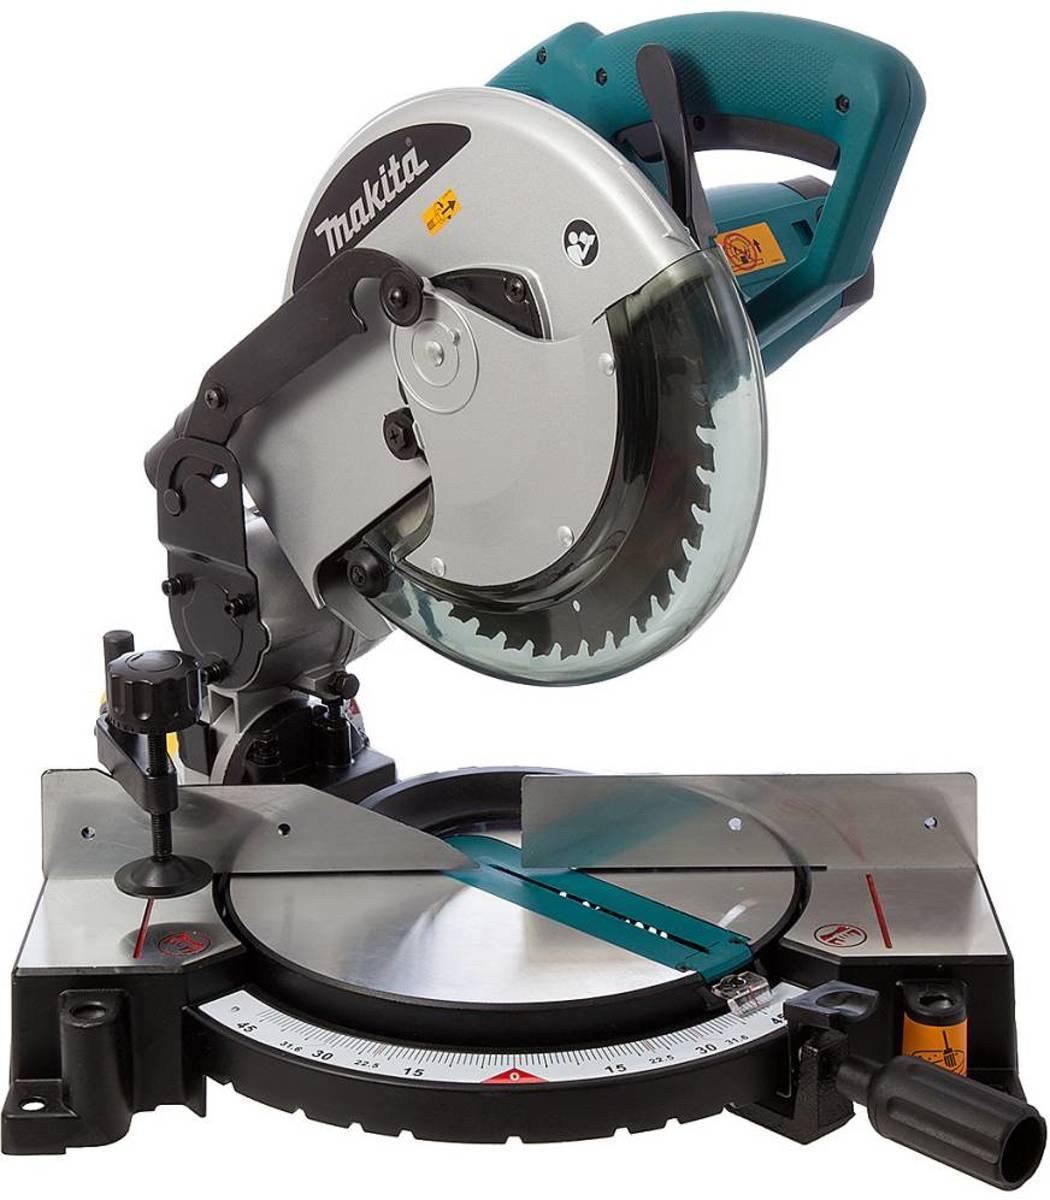 Makita Afkortzaag en verstekzaag 1500W-255mm MLS100